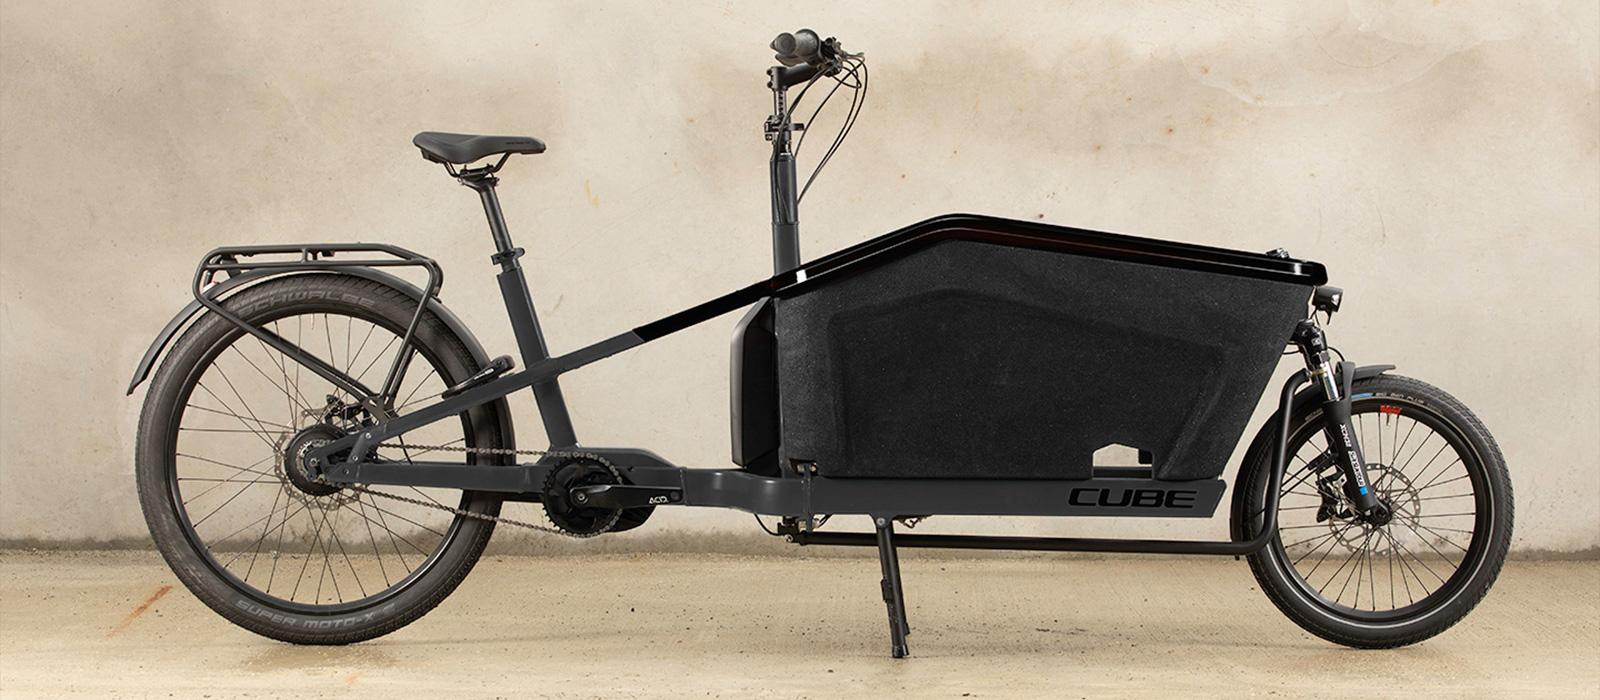 njustudio-cube-cargo-bike-h3